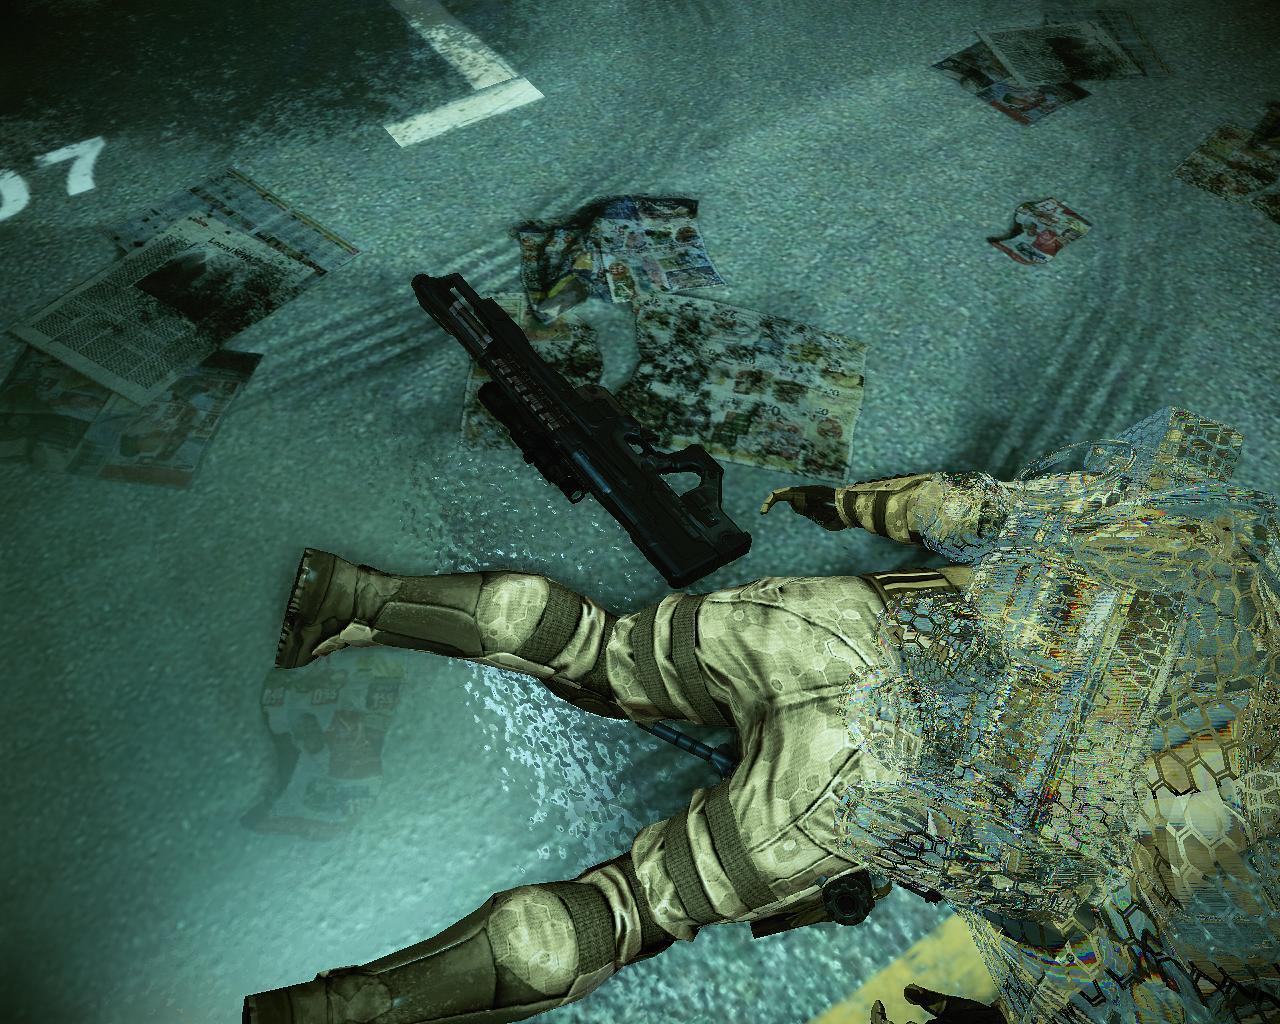 Crysis 3 directx 11 patch by skidrowrar